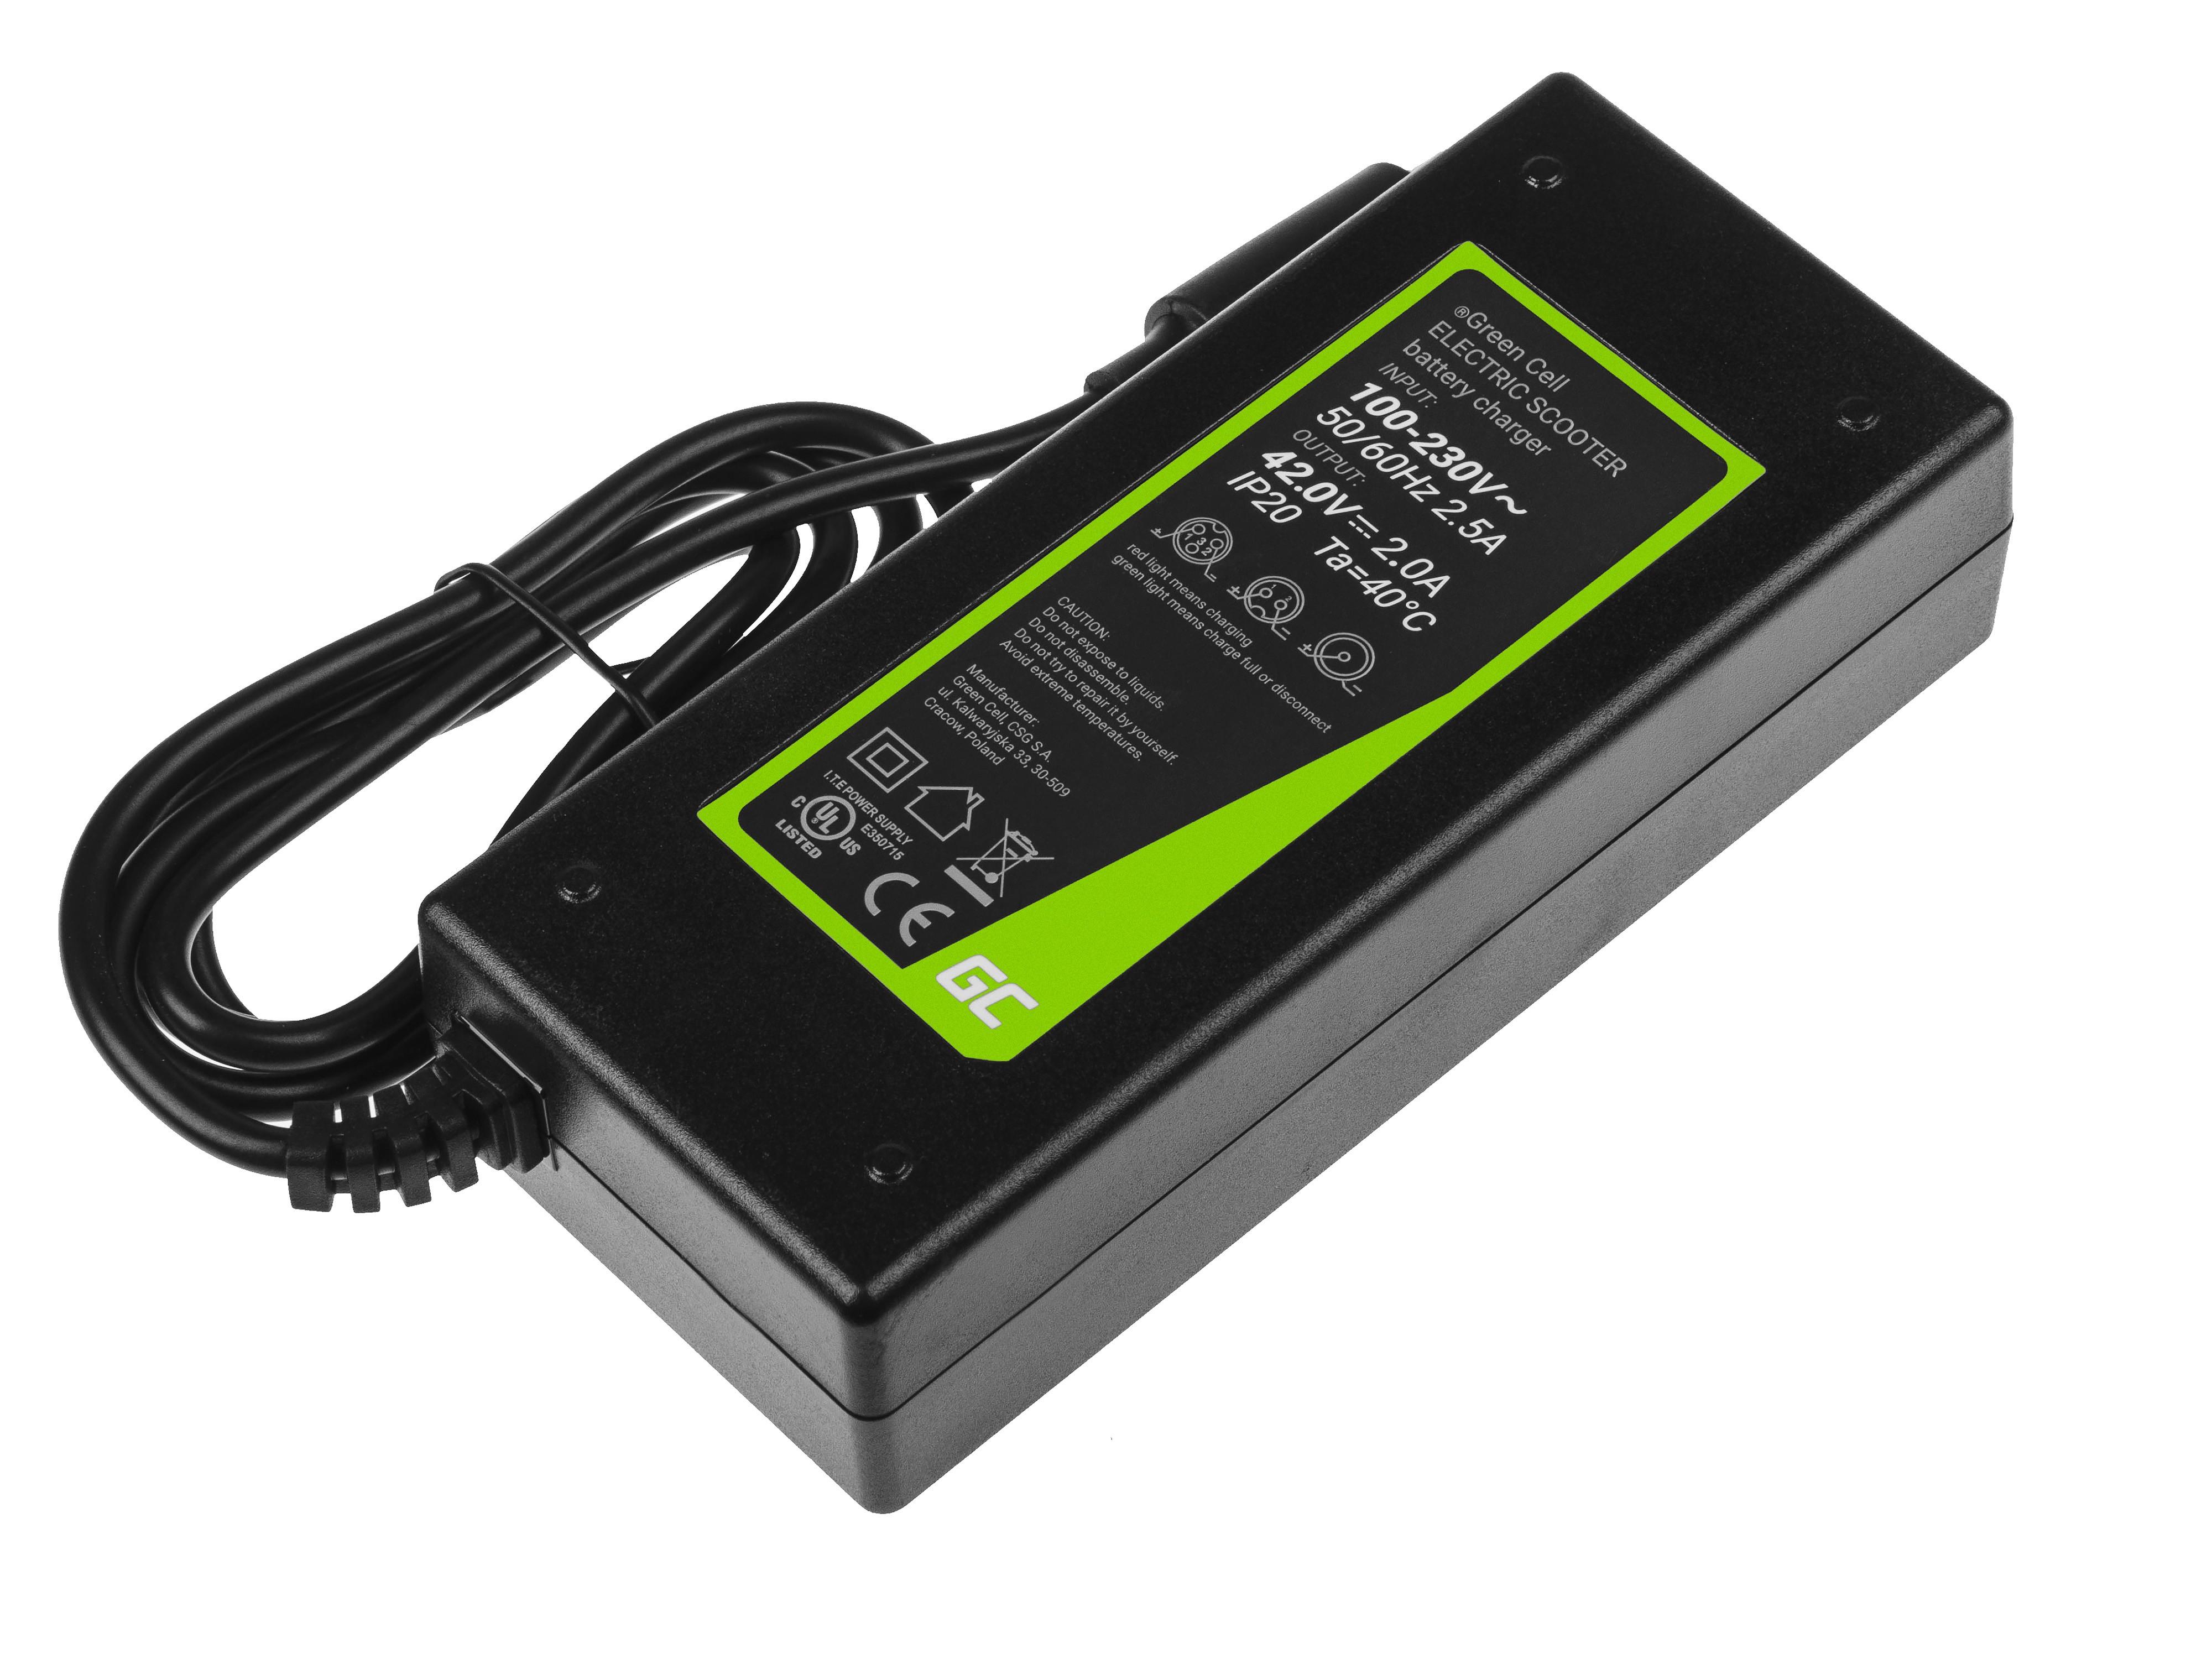 Green Cell 42V for Xiaomi Mijia M365, M365 Pro / Segway Ninebot ES1, ES2, ES3, ES4 / Lime / Hive / Bird Elektriskie skuteri un līdzsvara dēļi